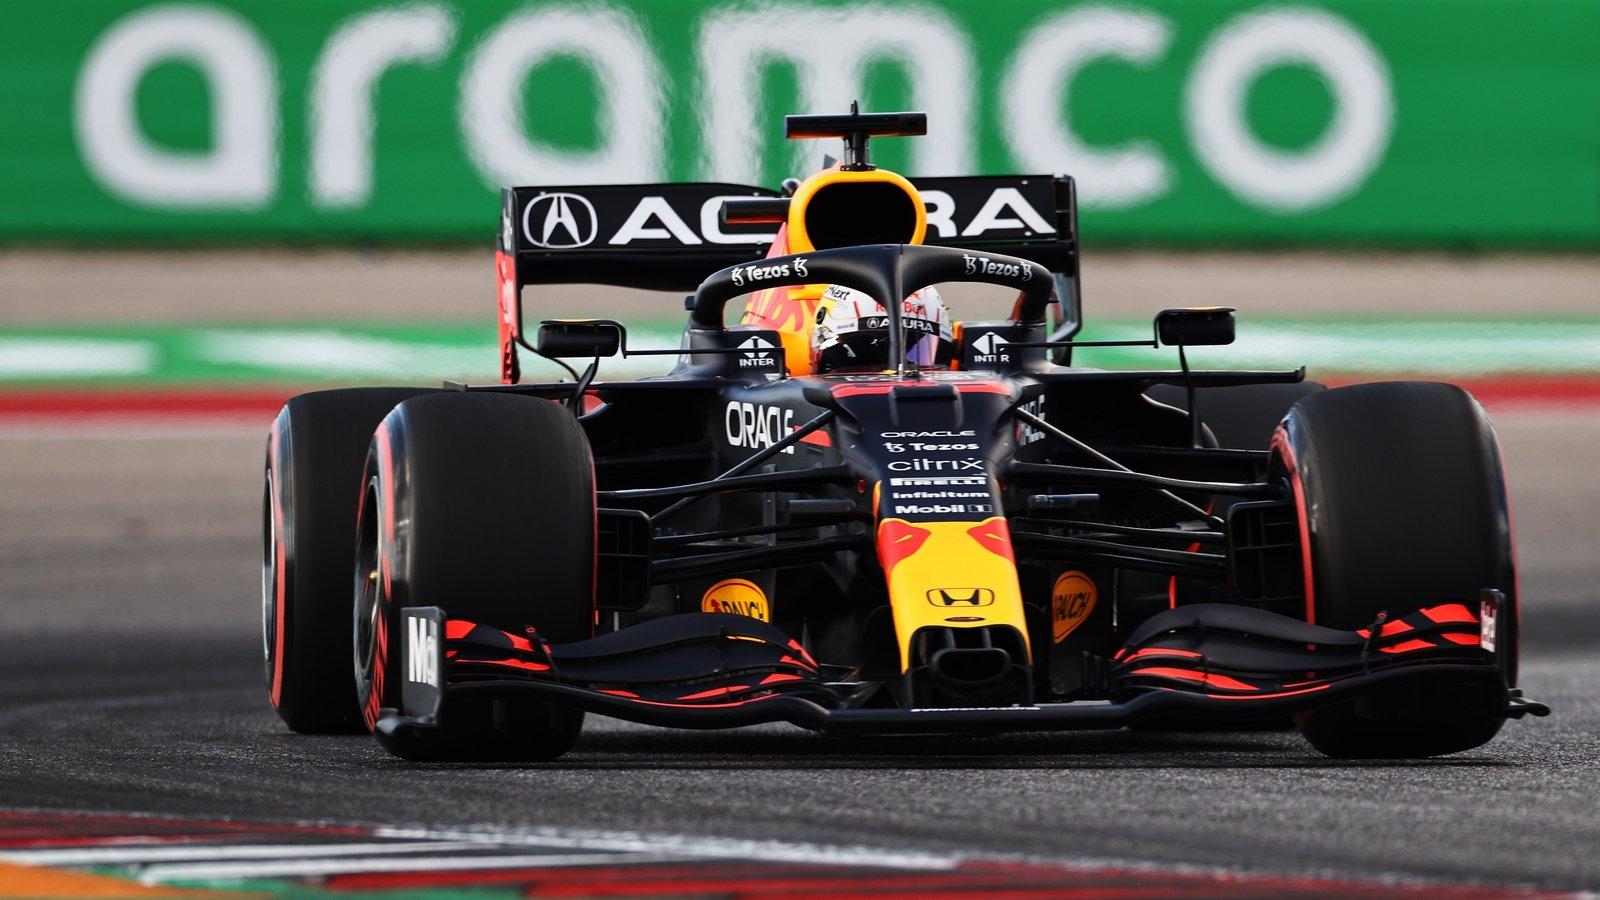 Max Verstappen takes pole ahead of Lewis Hamilton